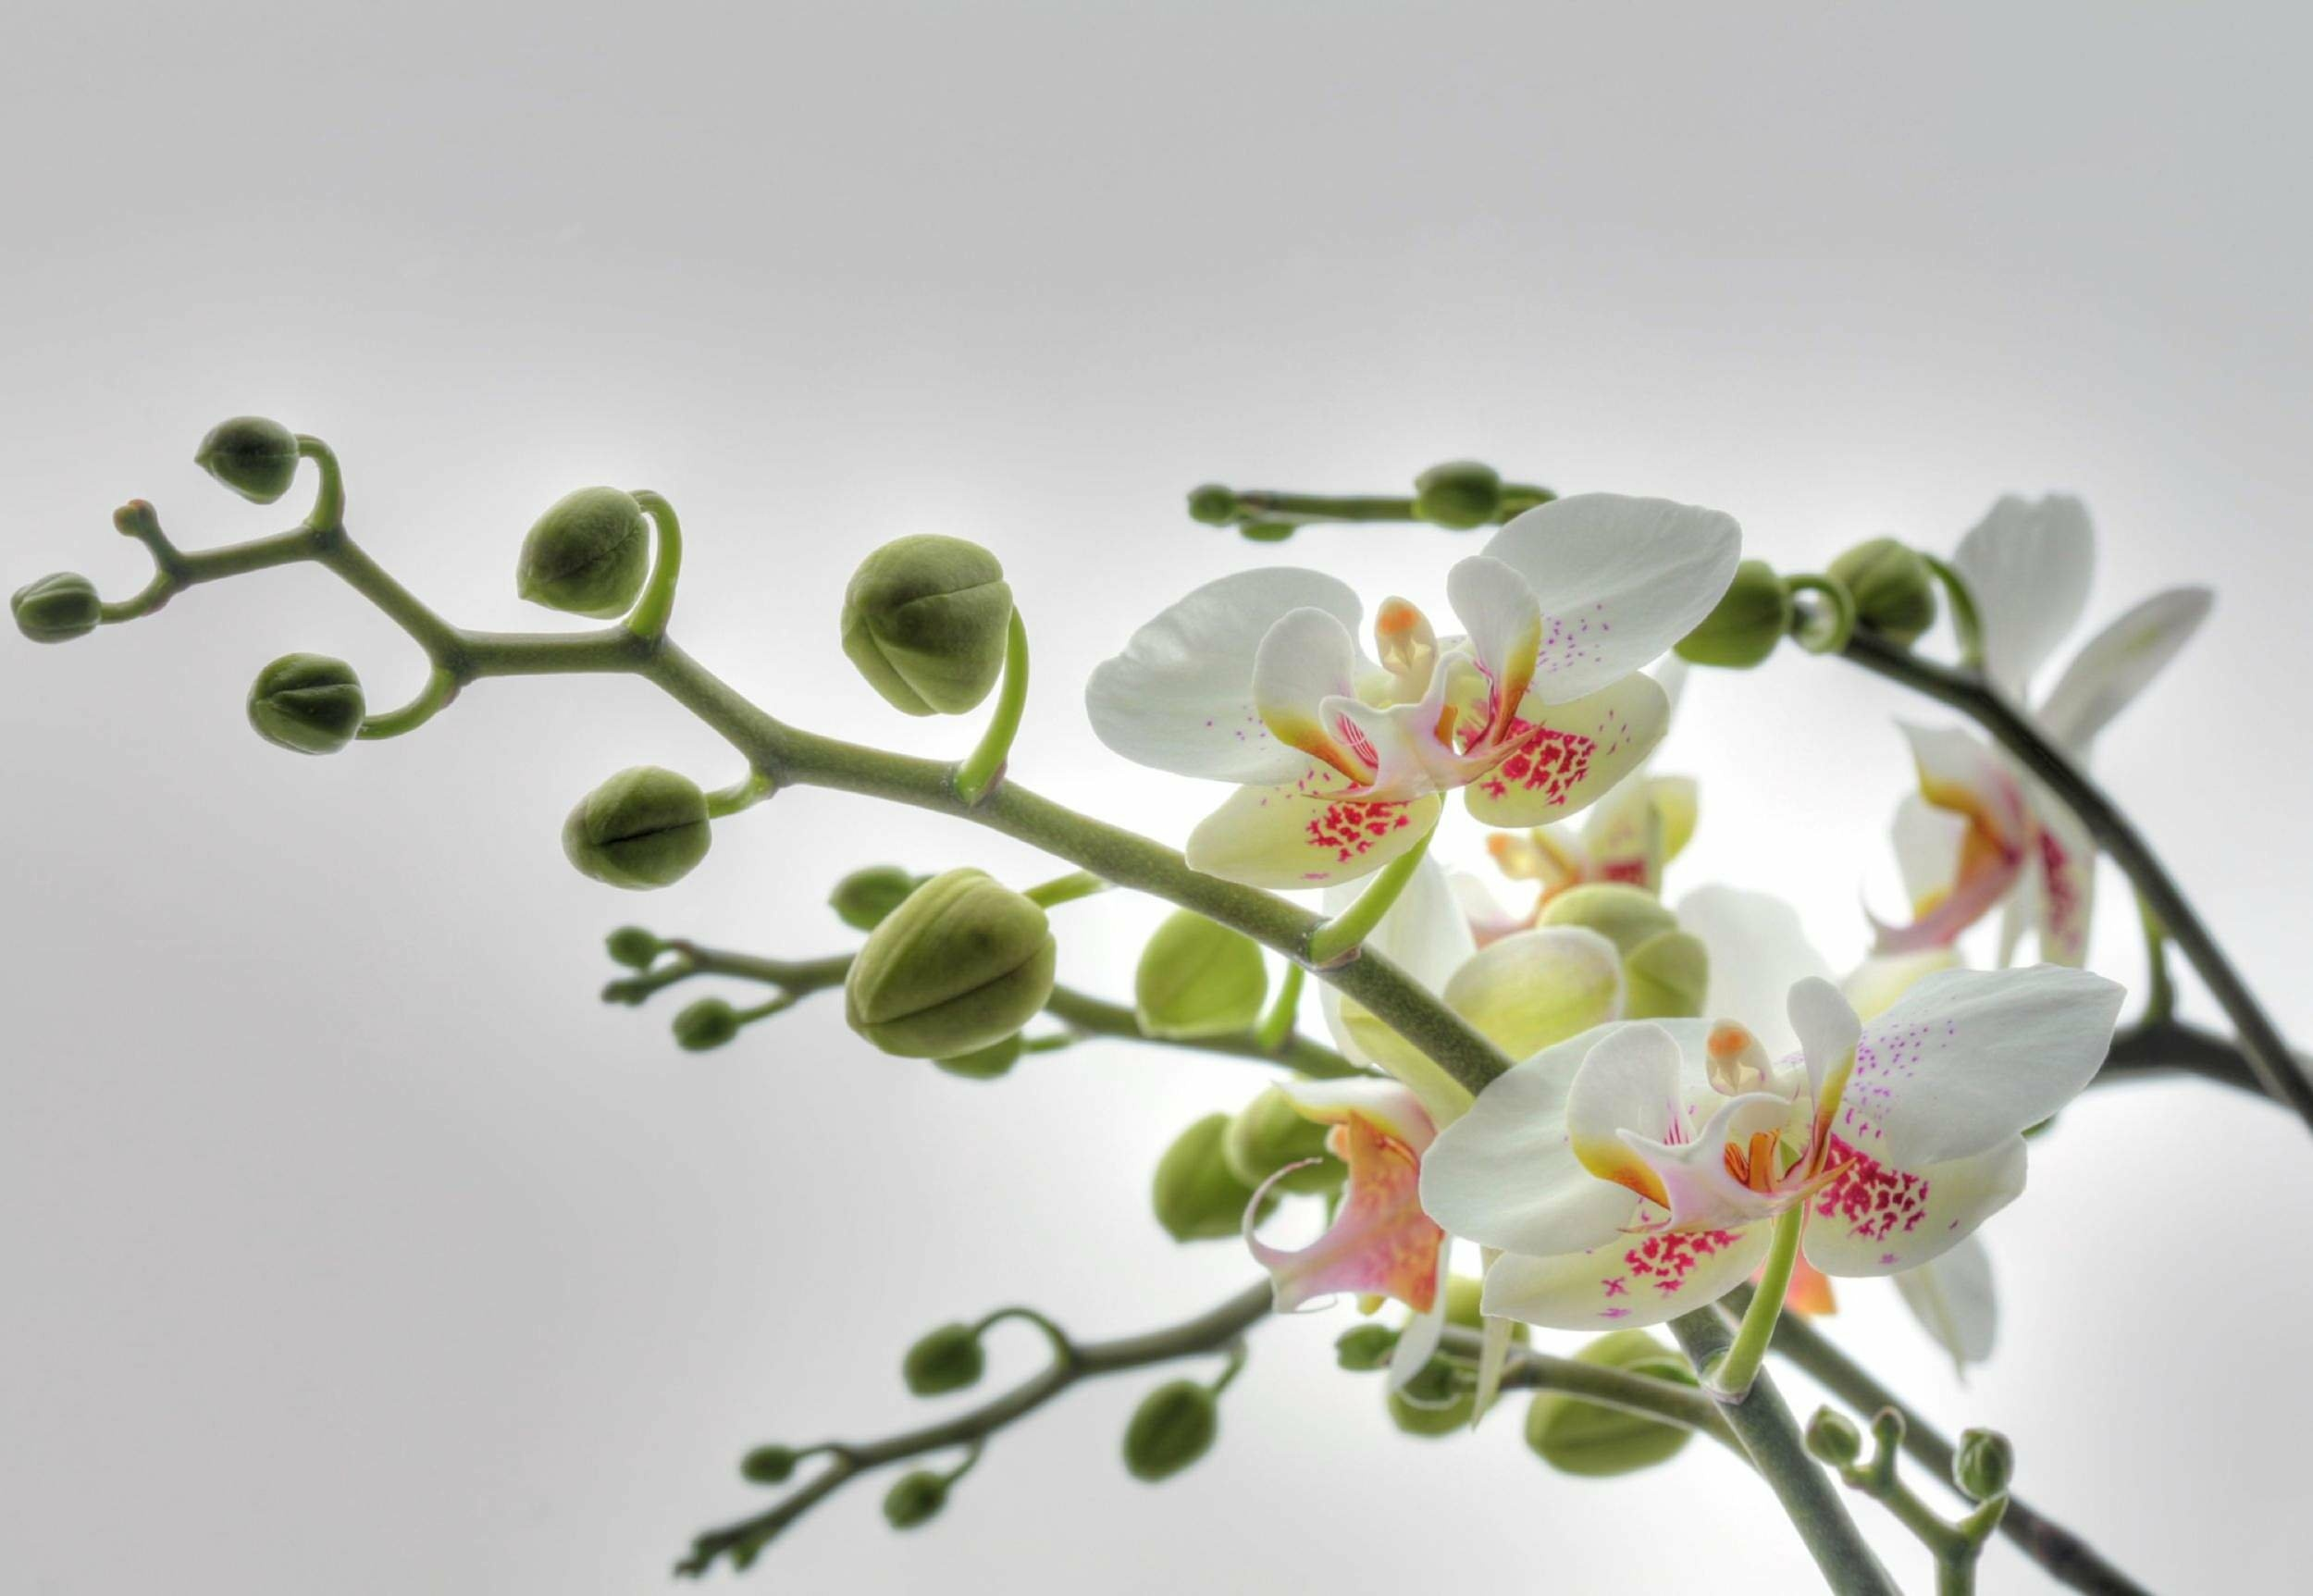 Fototapeta do salonu magnolia fototapety